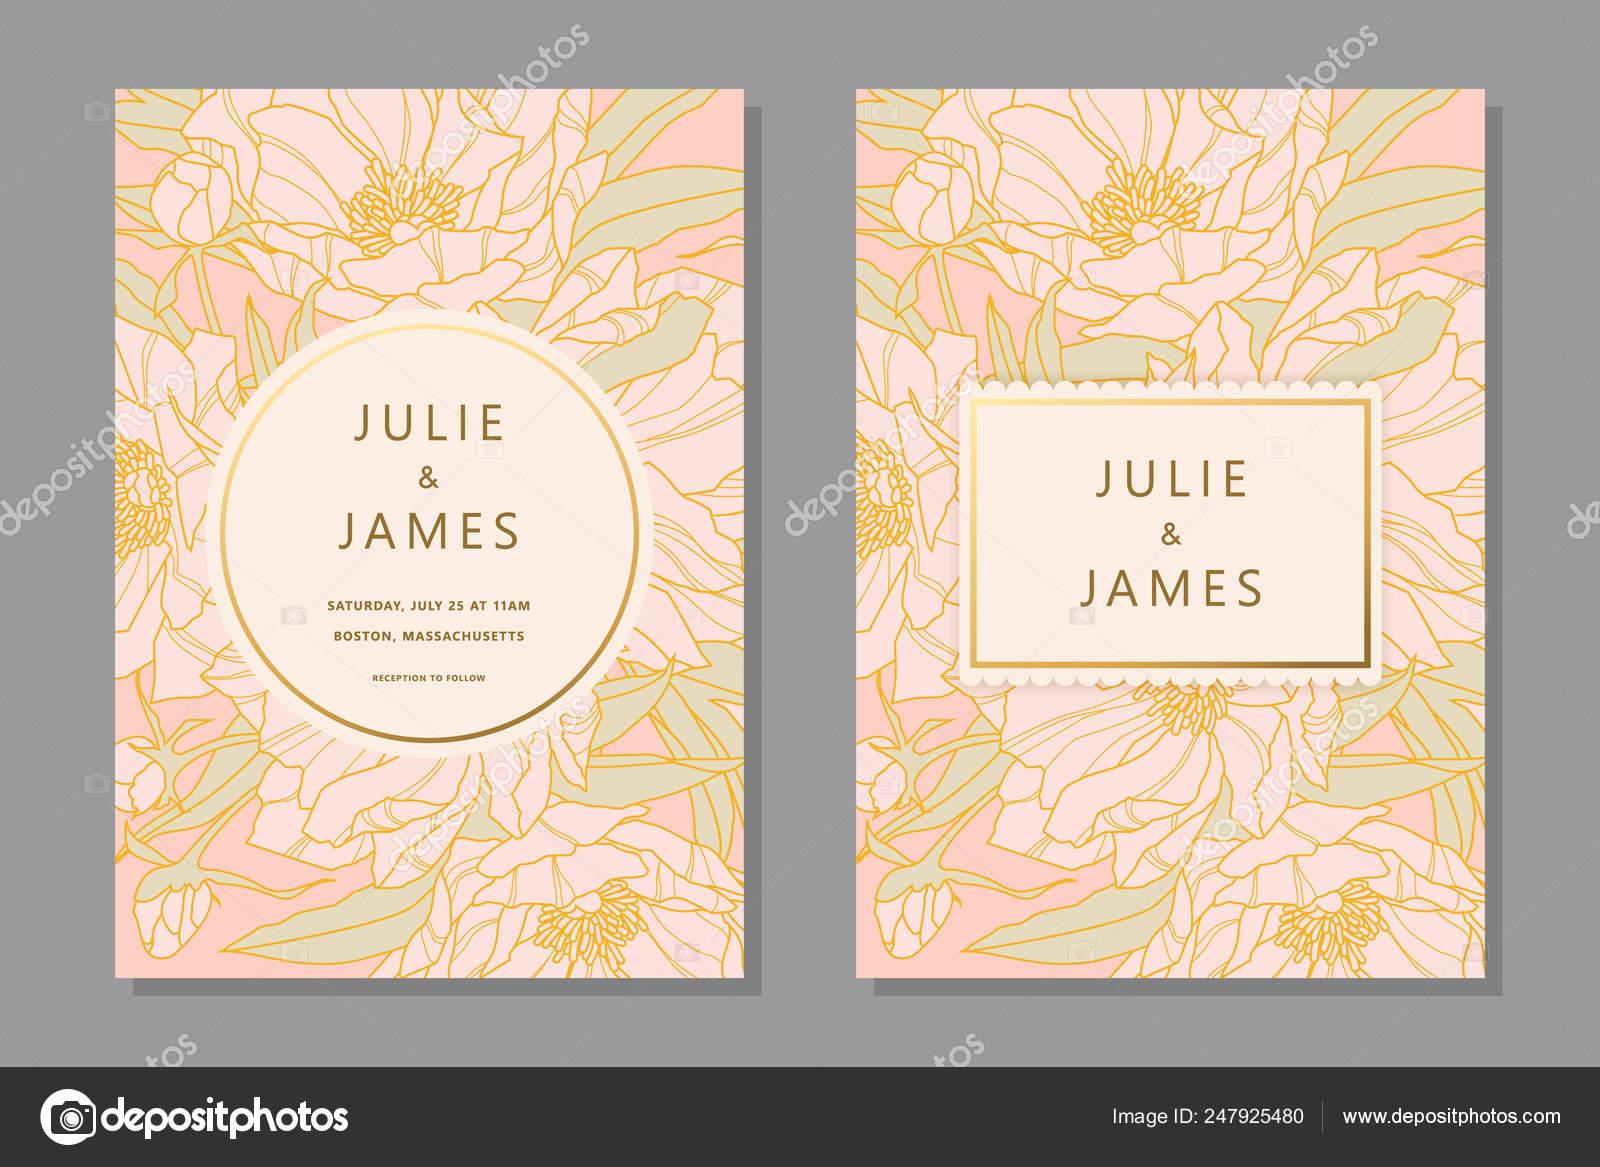 vintage wedding invitation set stock vector c greeek 247925480 https depositphotos com 247925480 stock illustration vintage wedding invitation set html